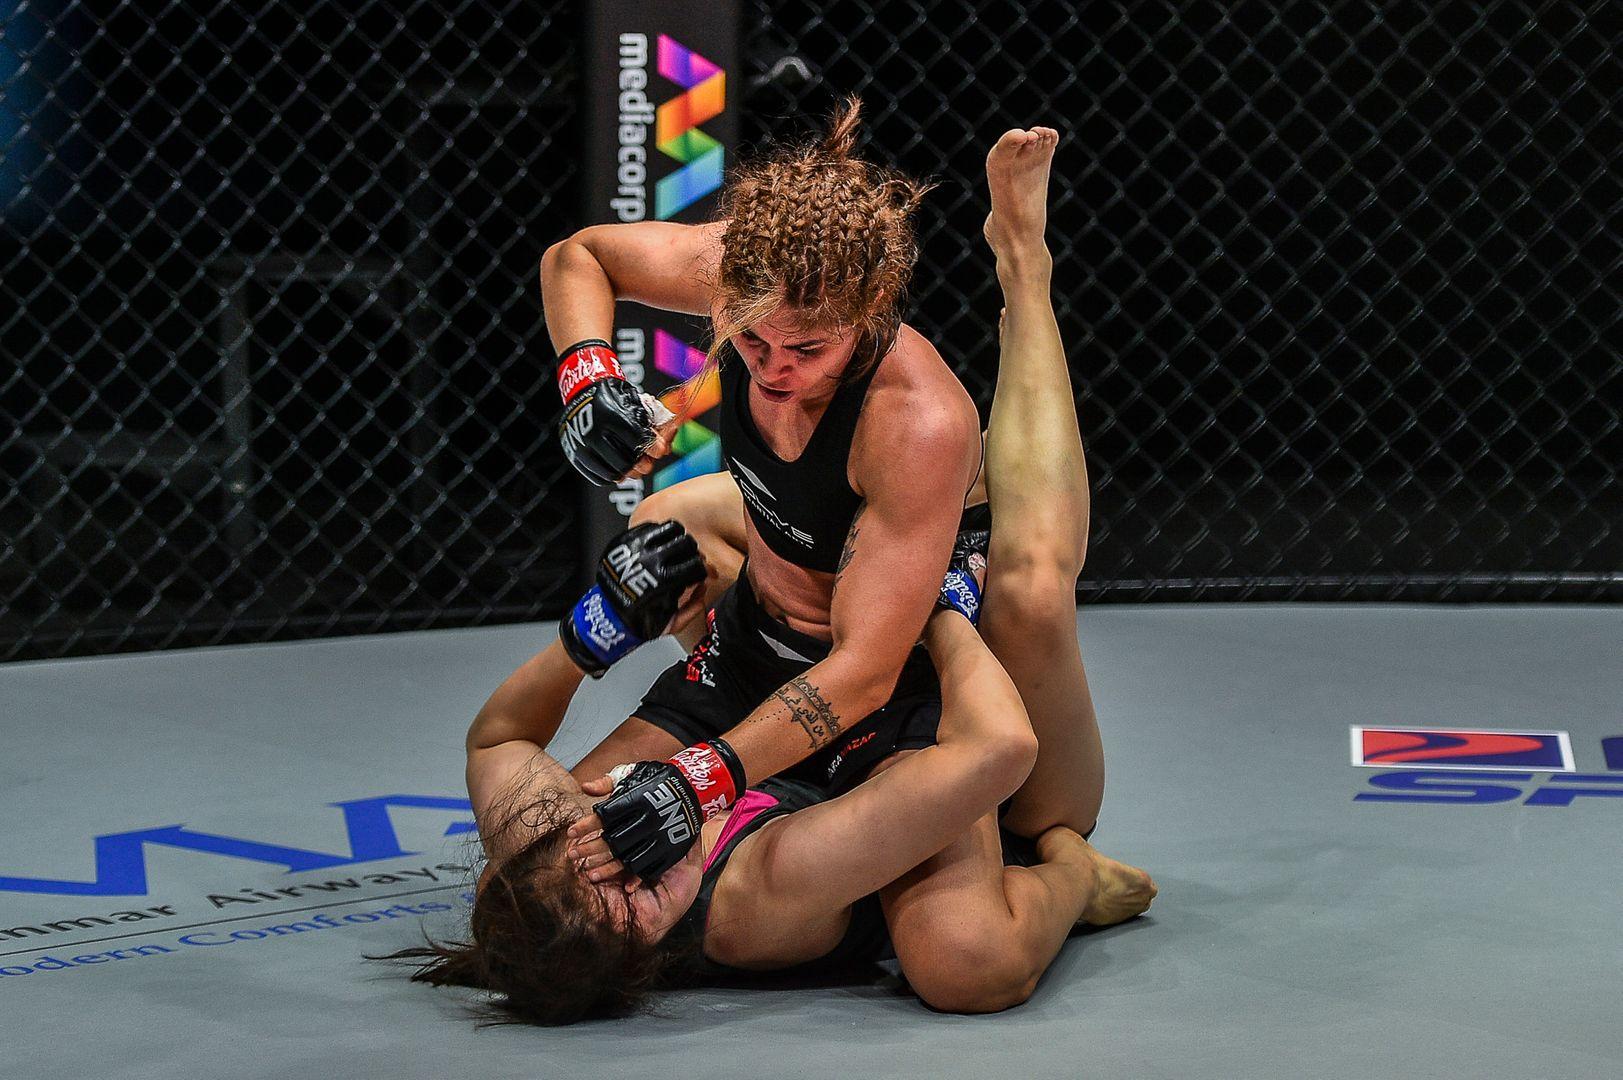 Brazilian MMA star Maira Mazar fights South Korean knockout artist Choi Jeong Yun at ONE: INSIDE THE MATRIX IV